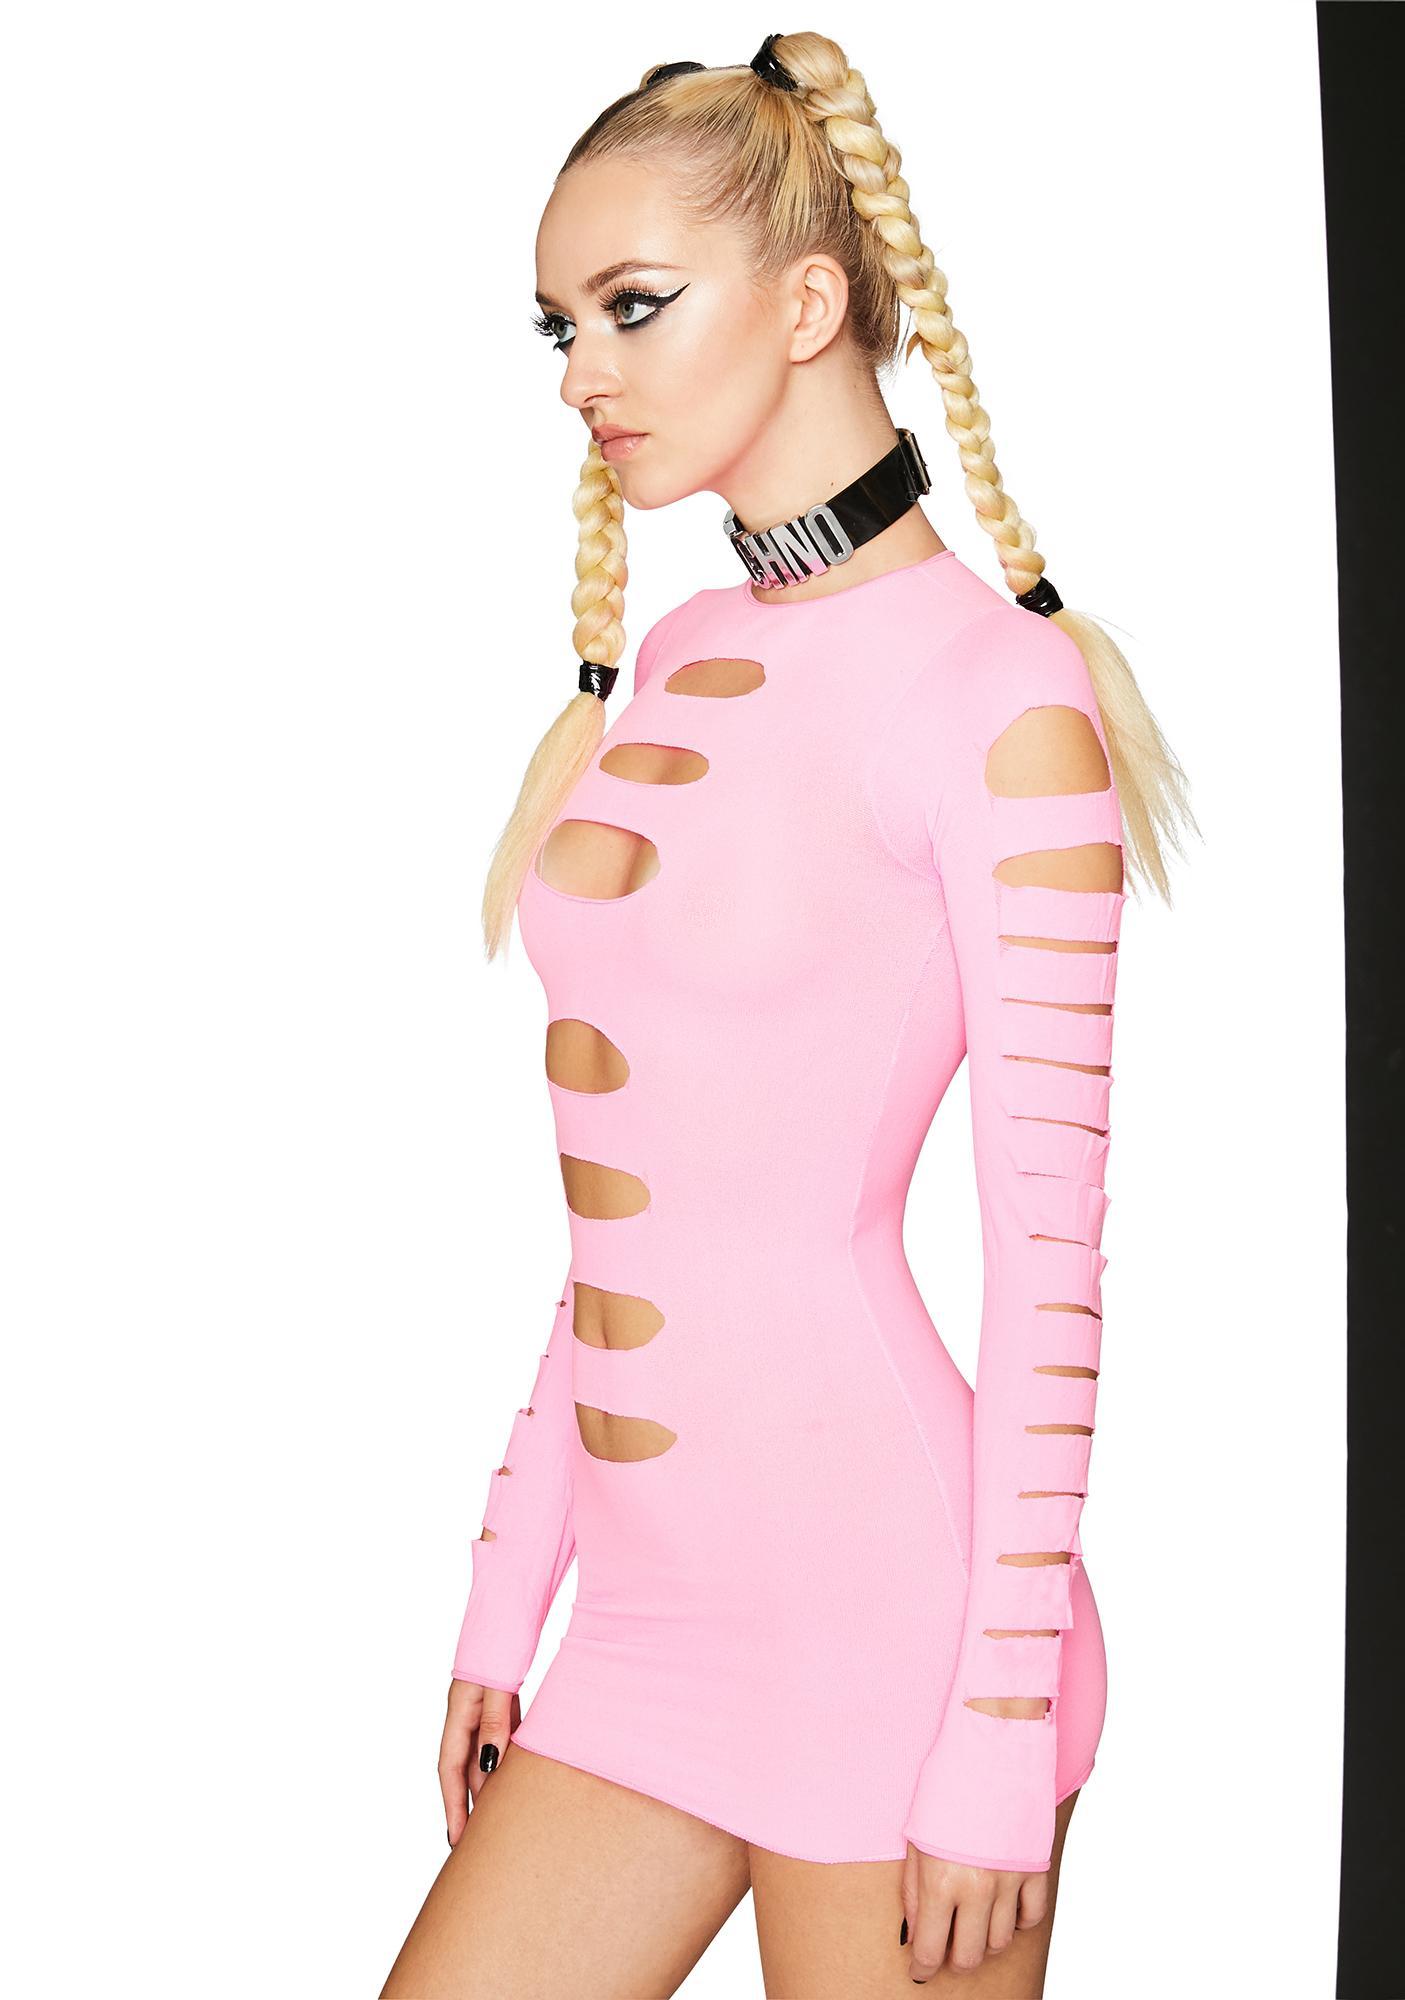 Rose Lady Galaxia Mini Dress